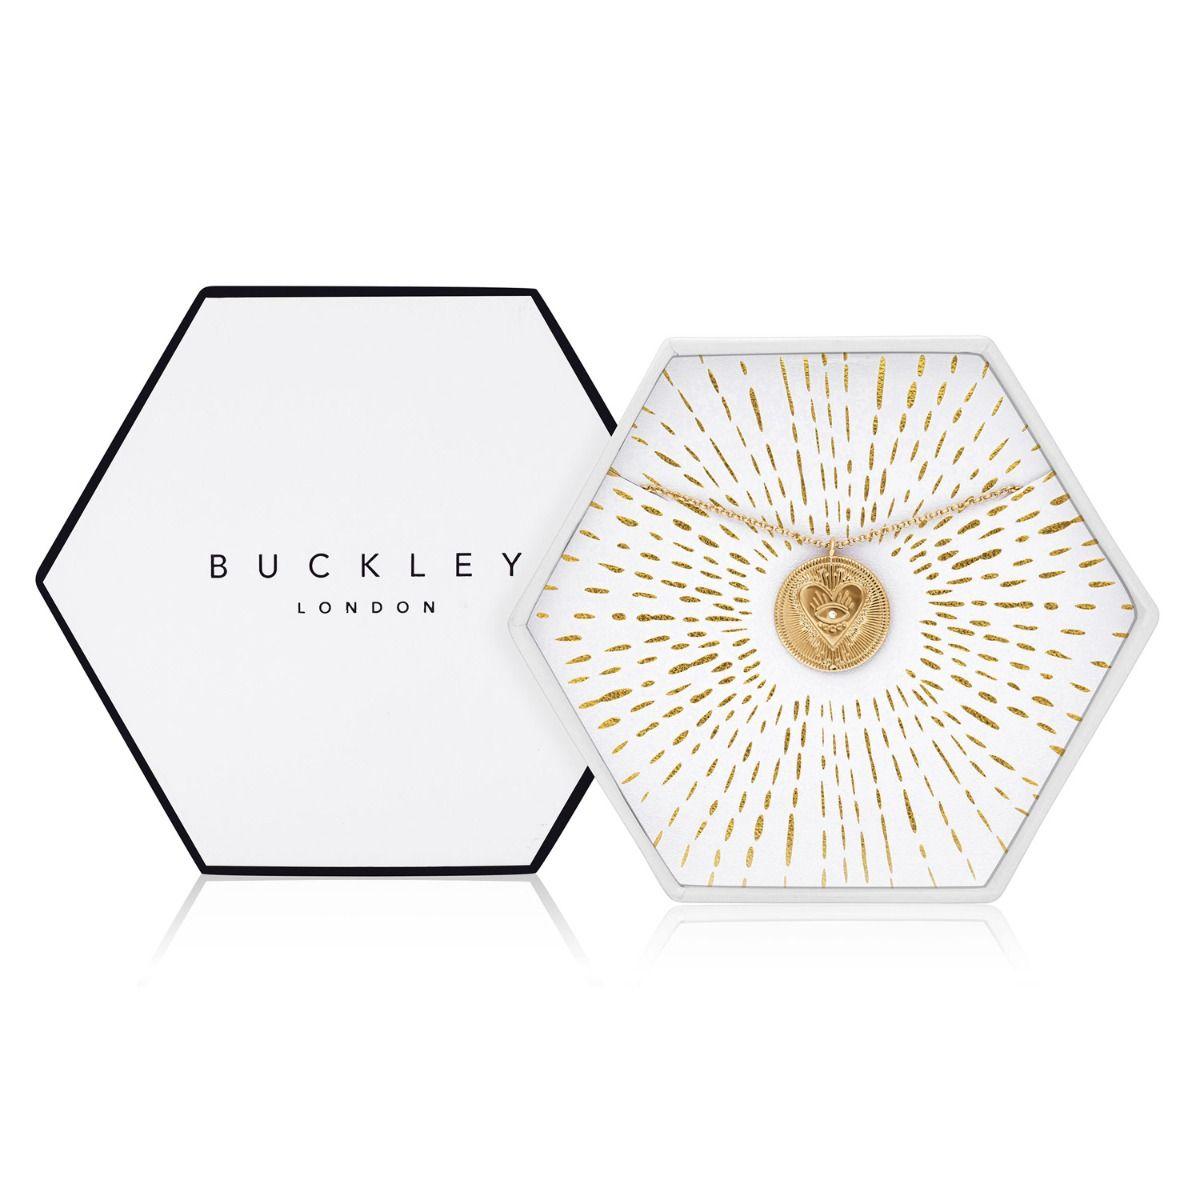 Buckley London Talisman Pendant